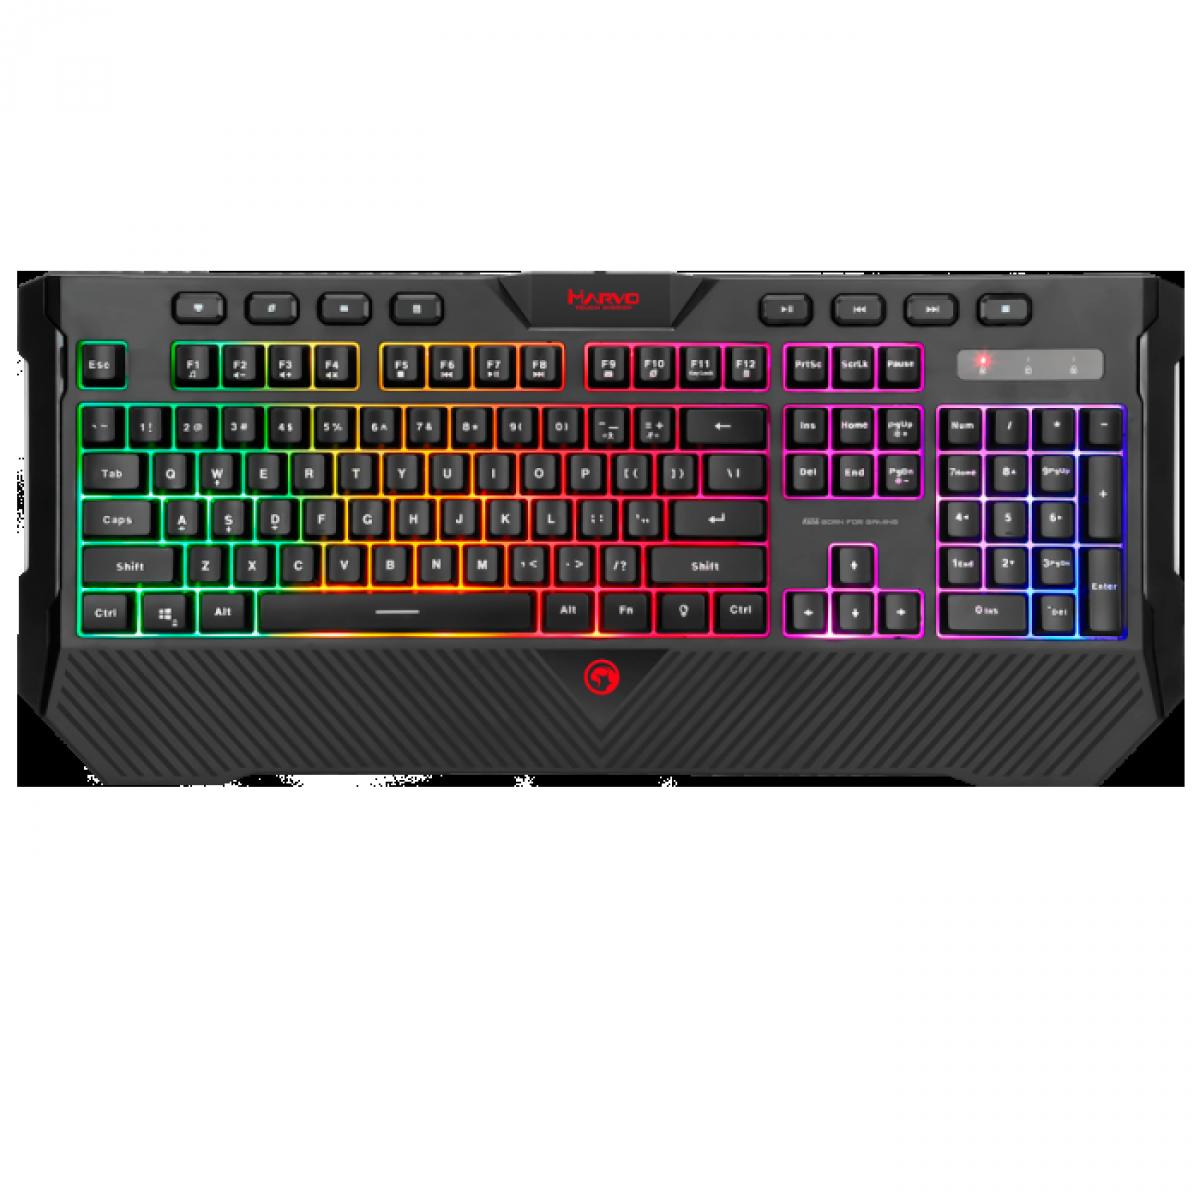 Teclado Gamer Marvo K656, Membrana, Rainbow